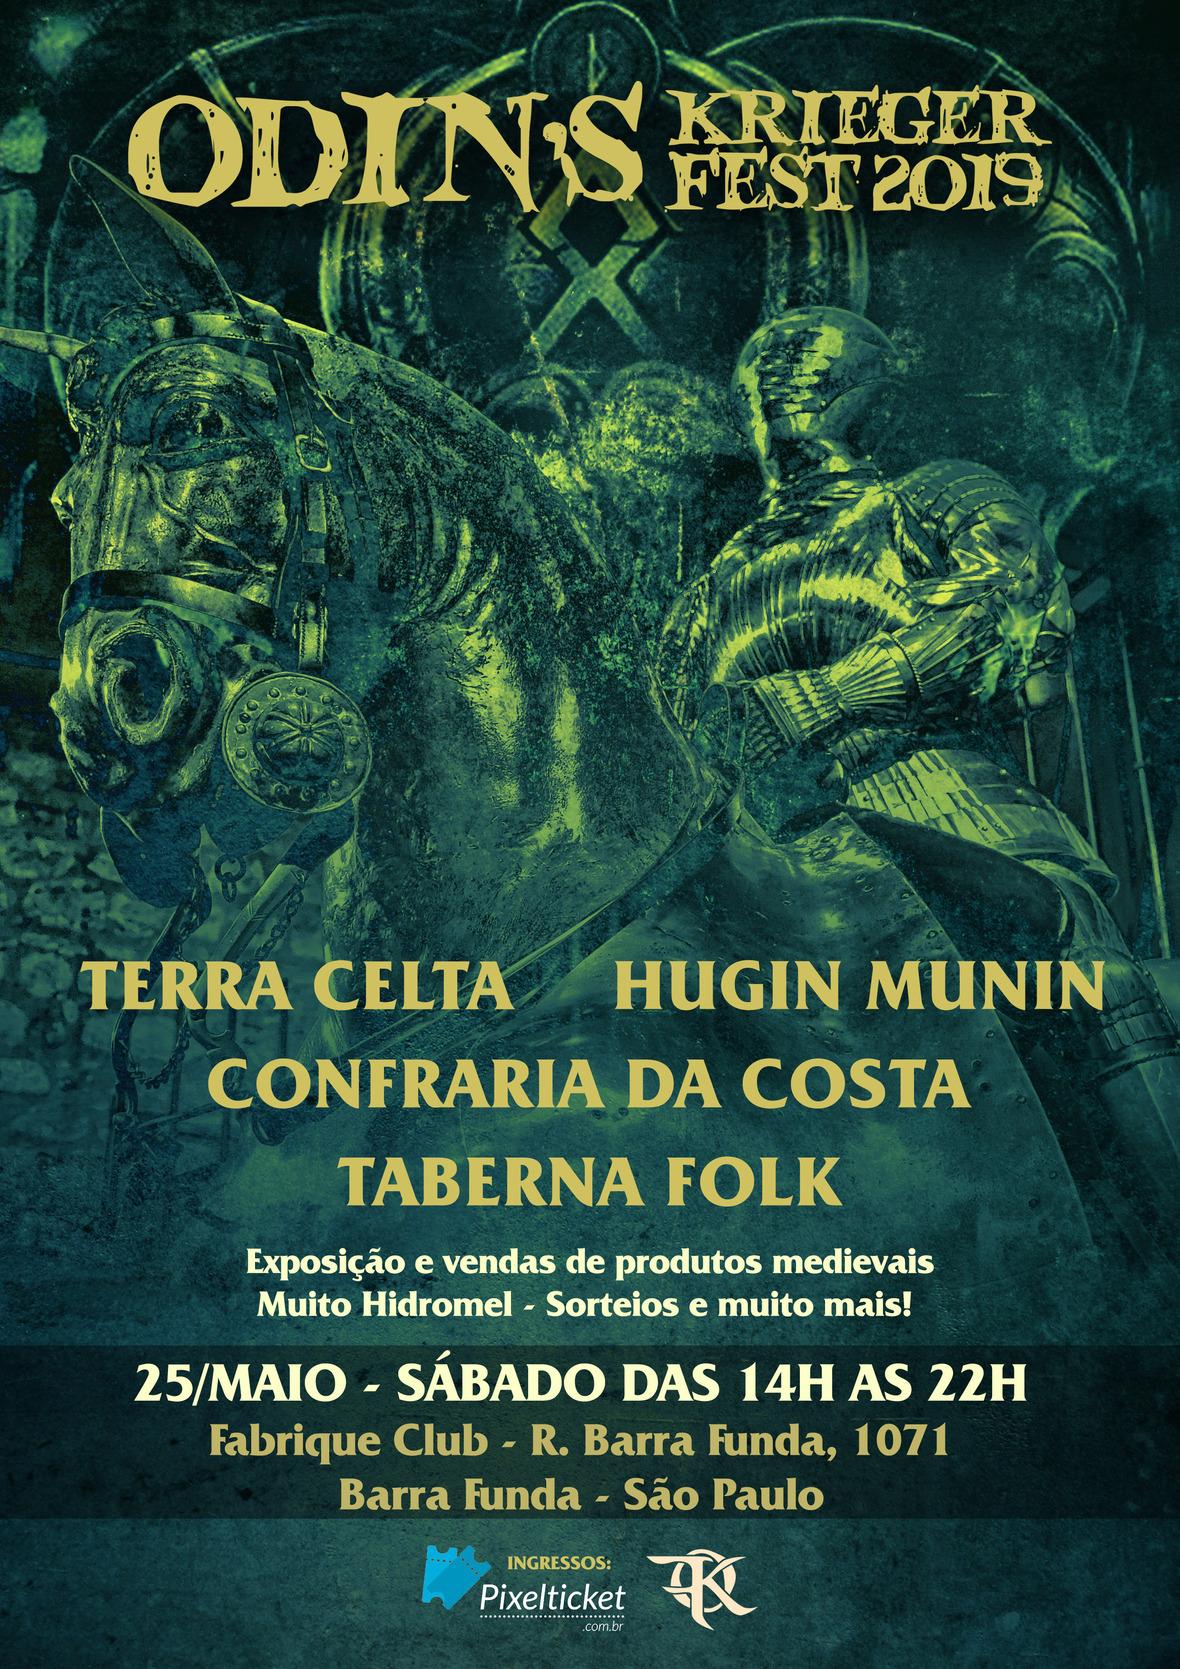 Odins Krieger Fest - A4 Geral 01